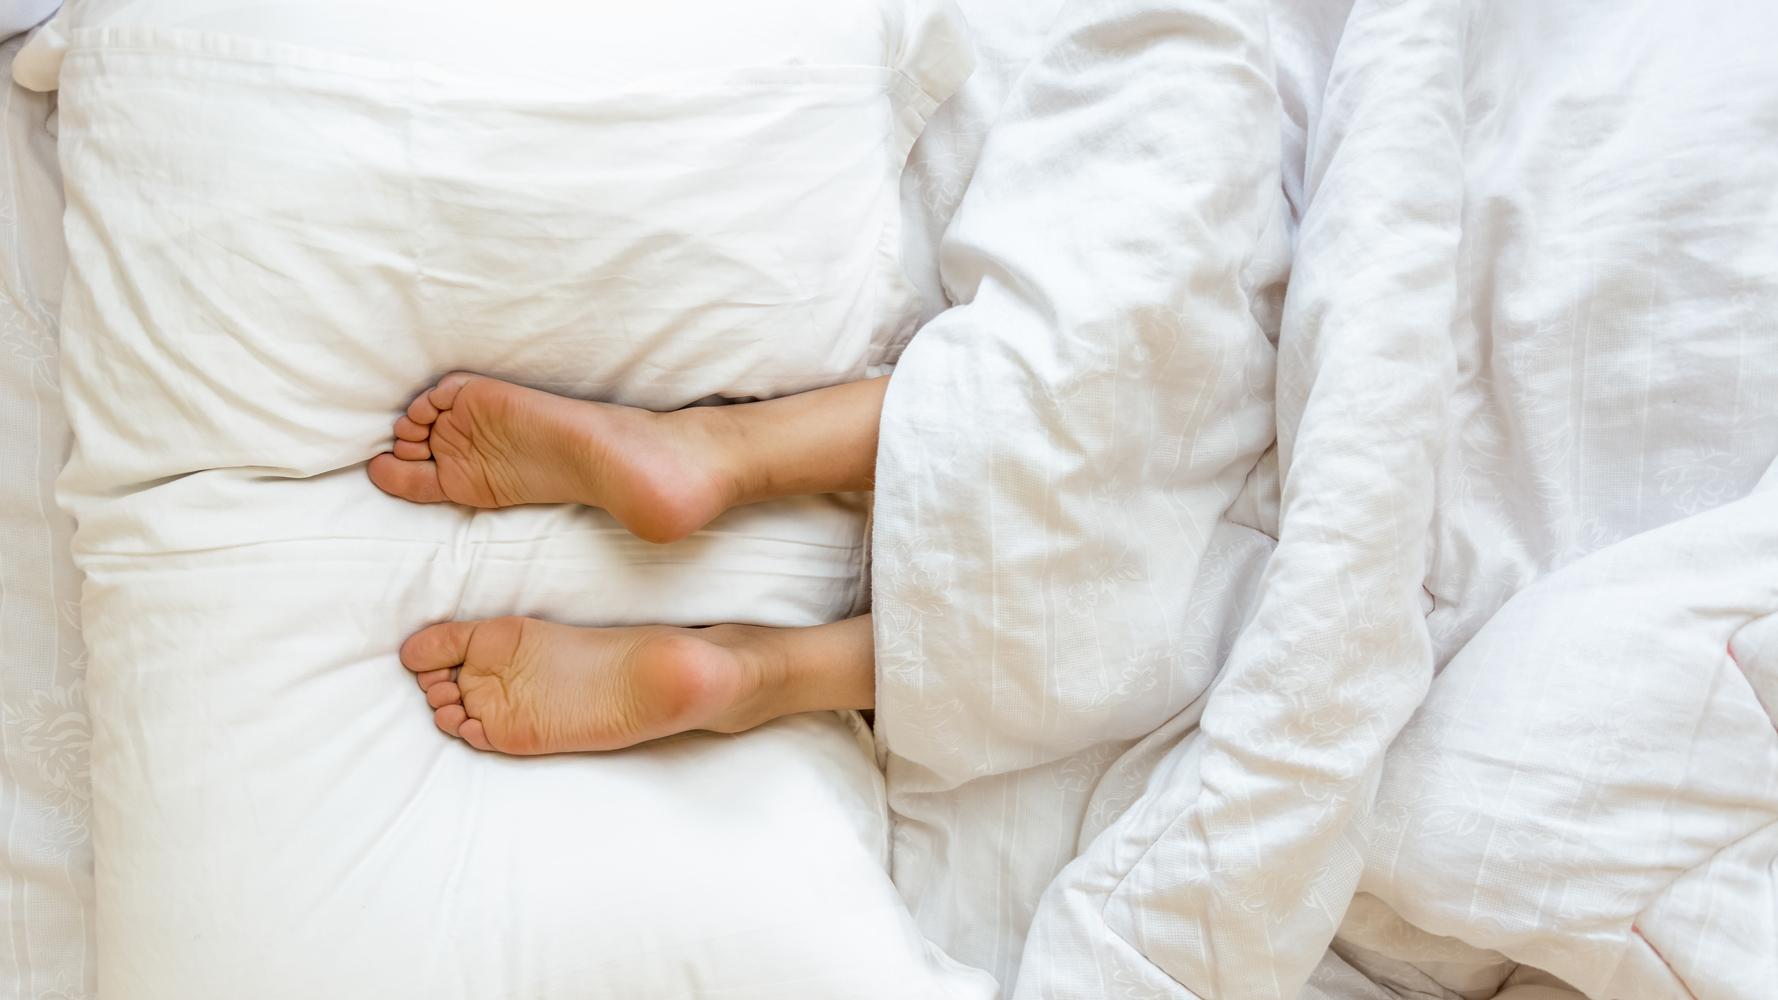 Unklare Herkunft auch bei Bettwaren-Daunen